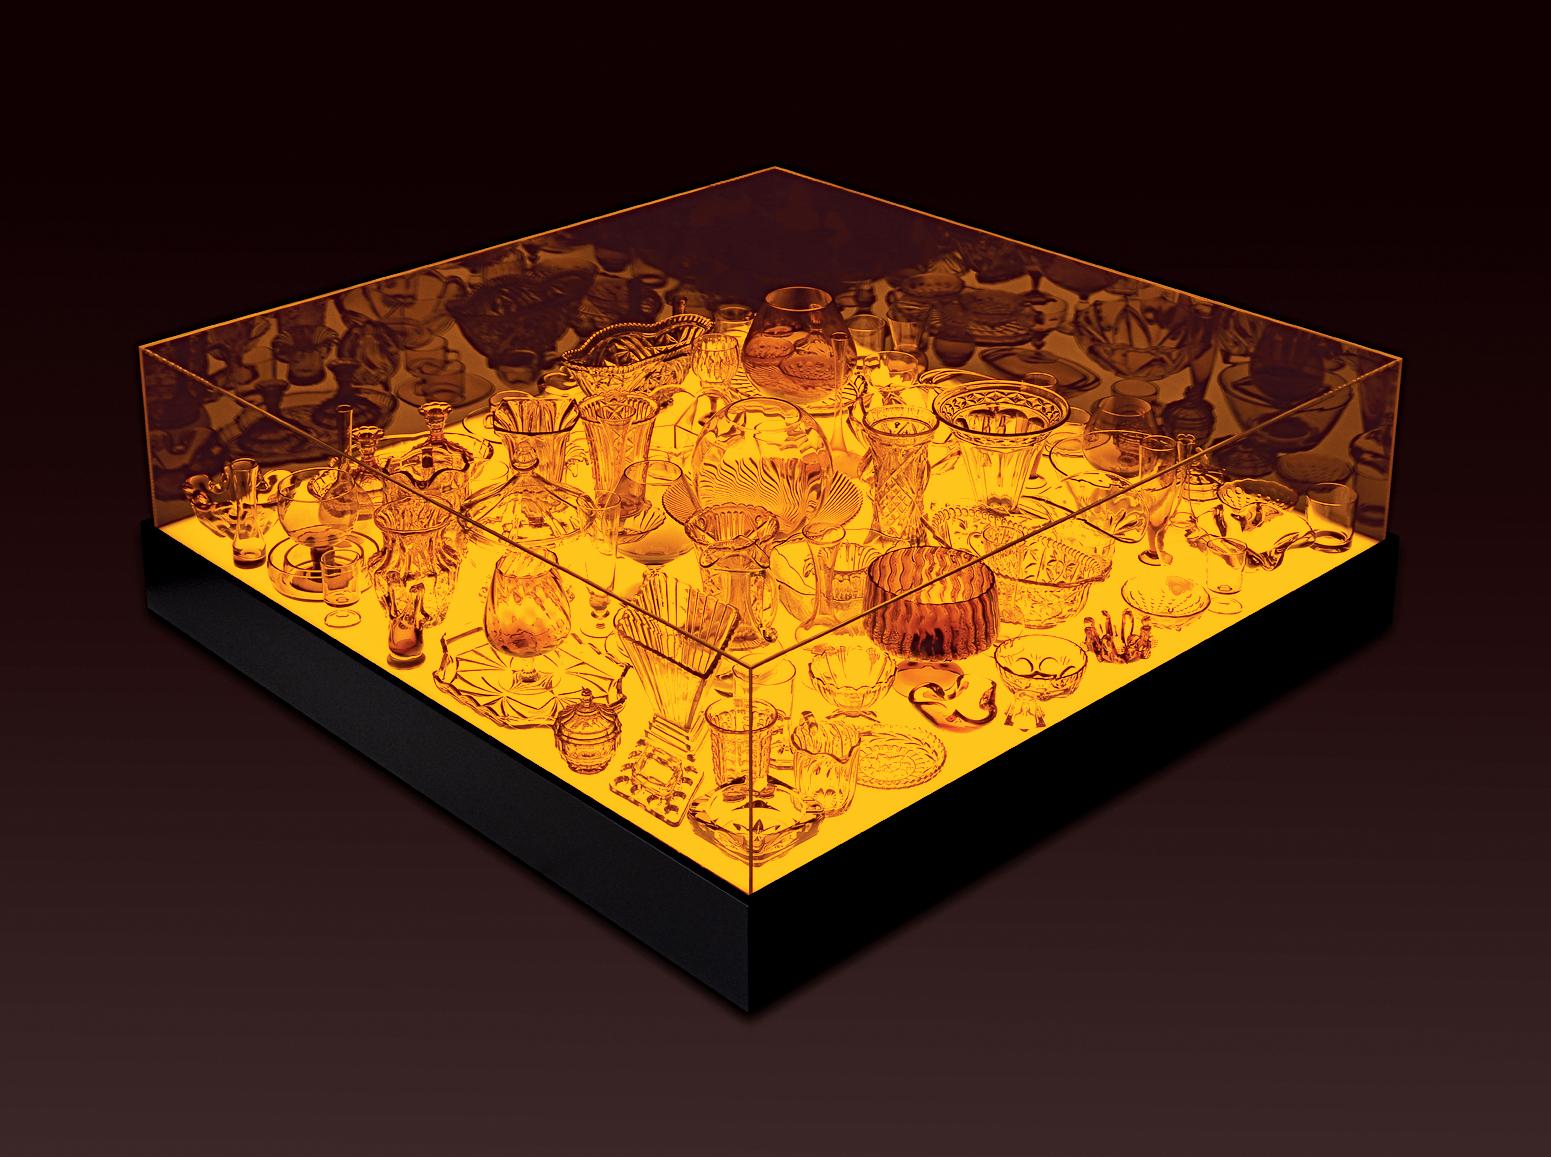 haygarth aladdin table